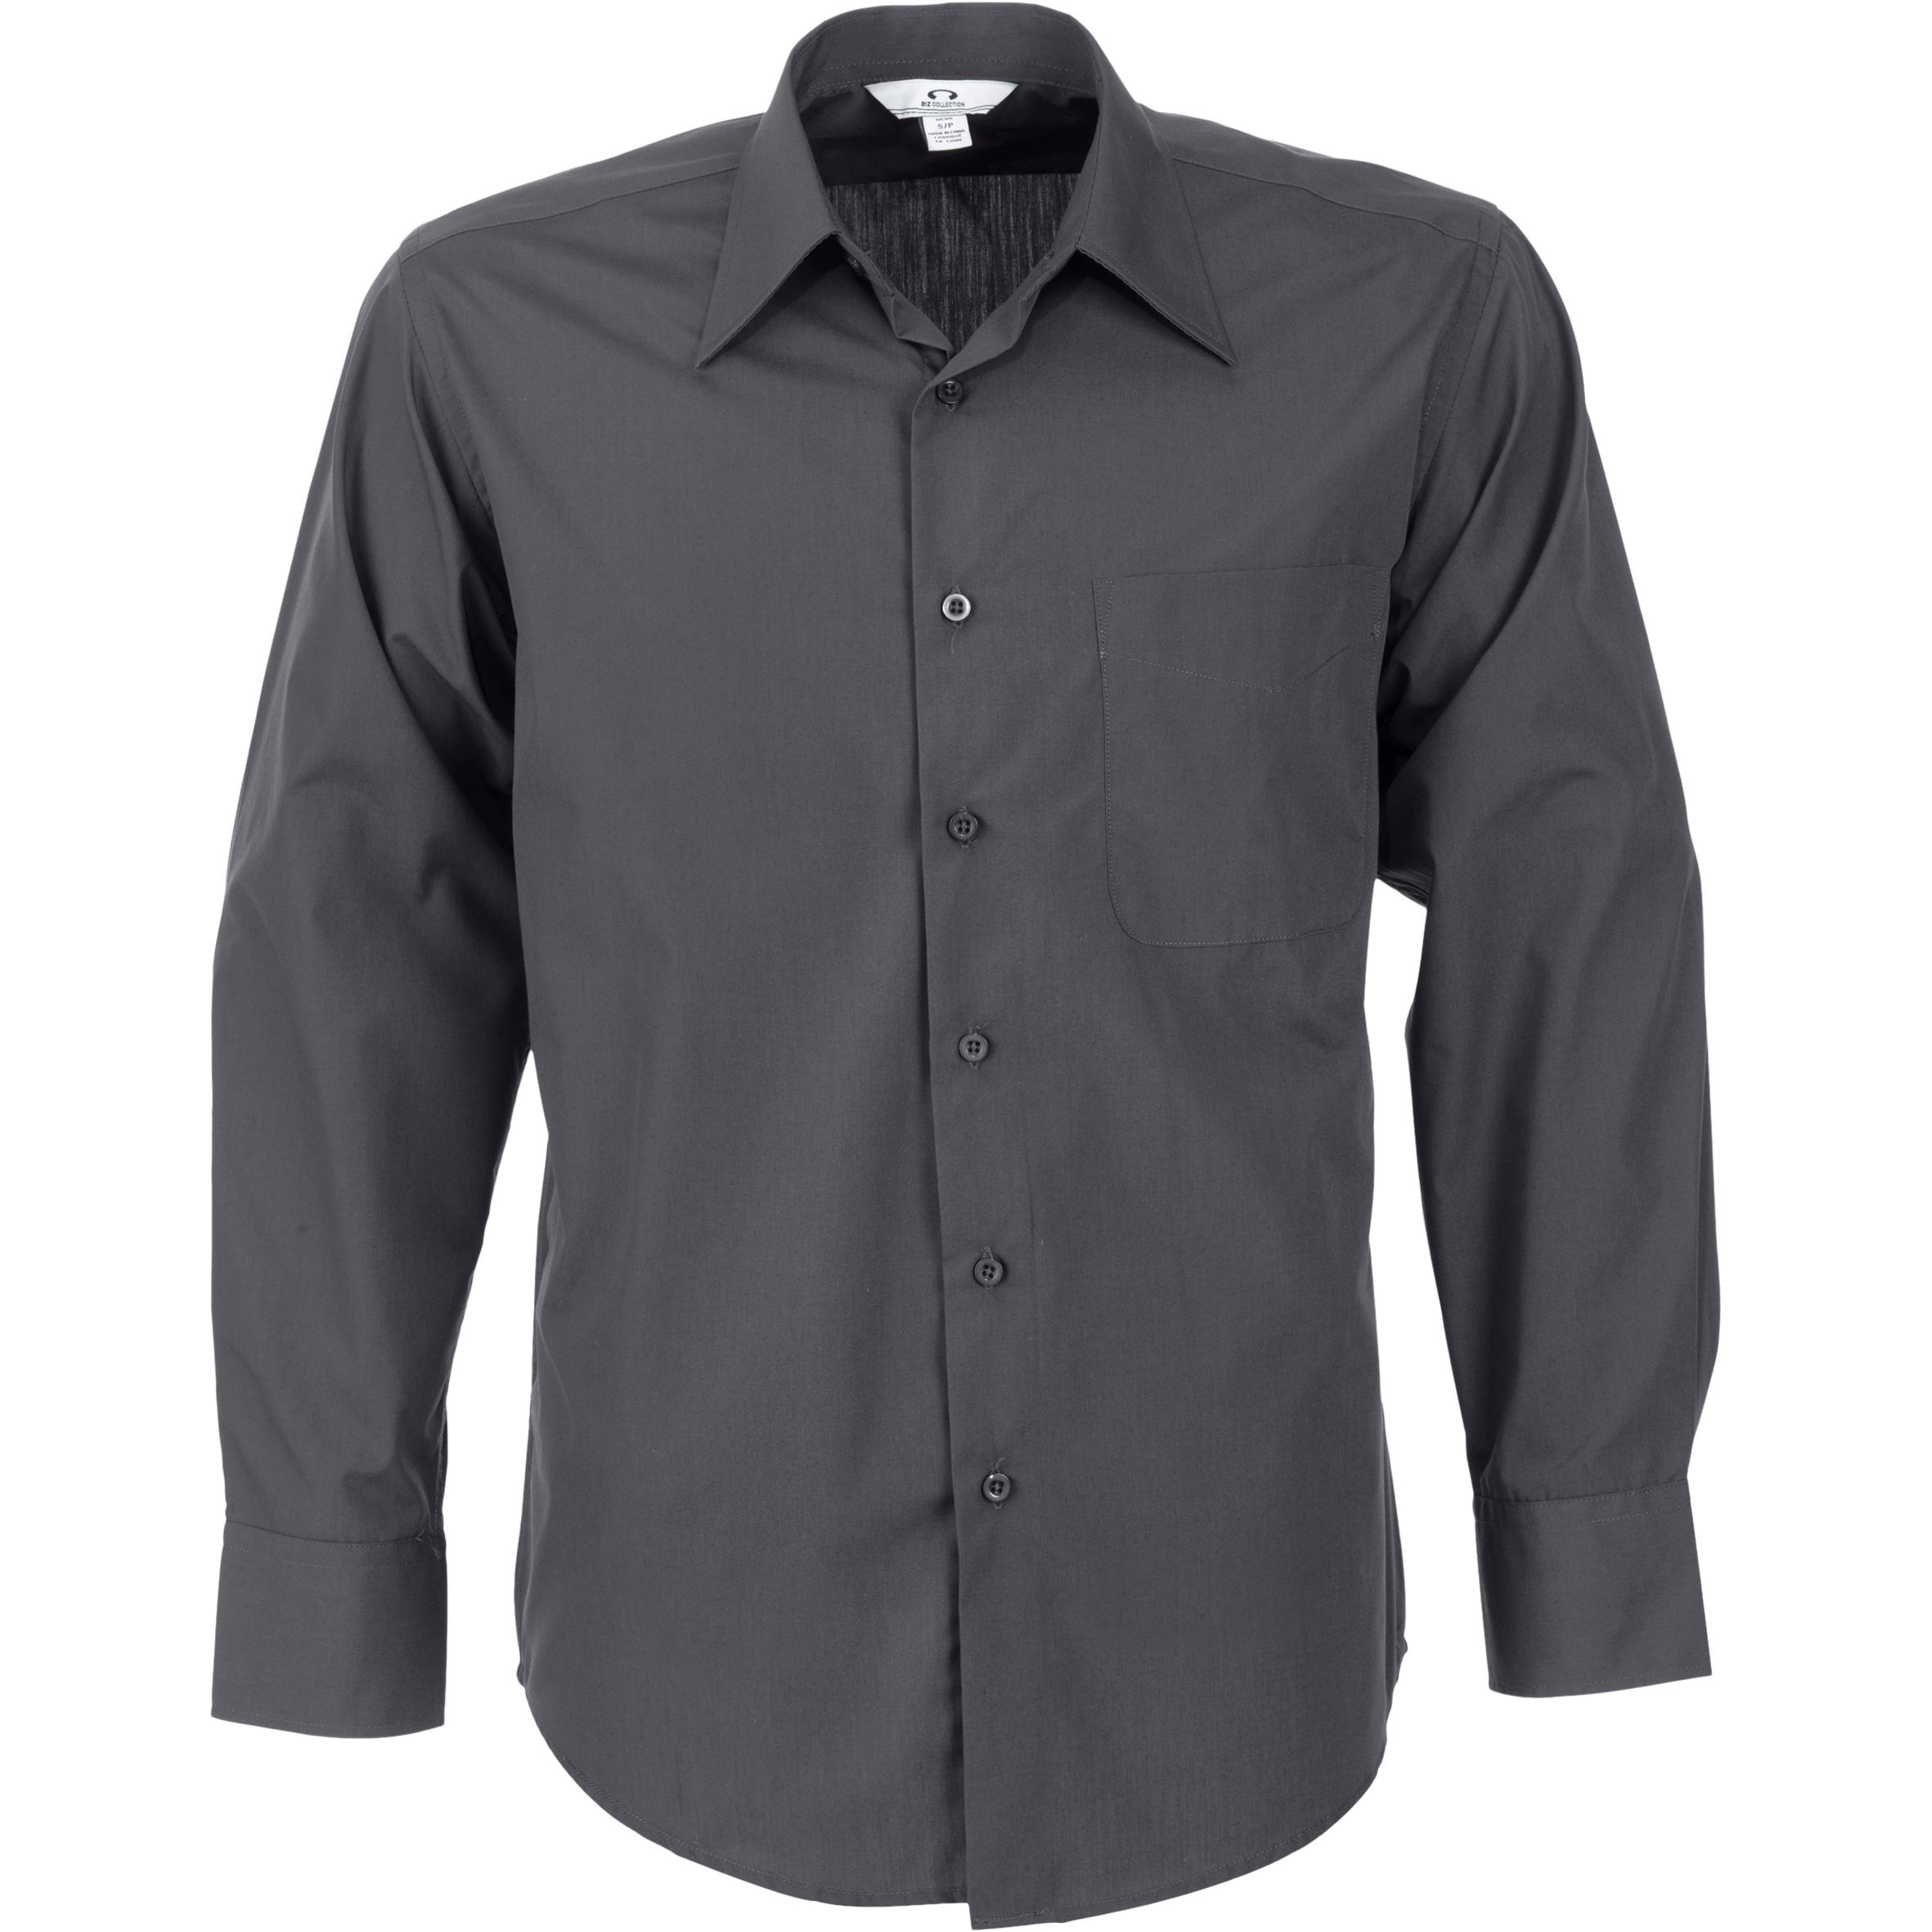 Mens Long Sleeve Metro Shirt - Grey Only